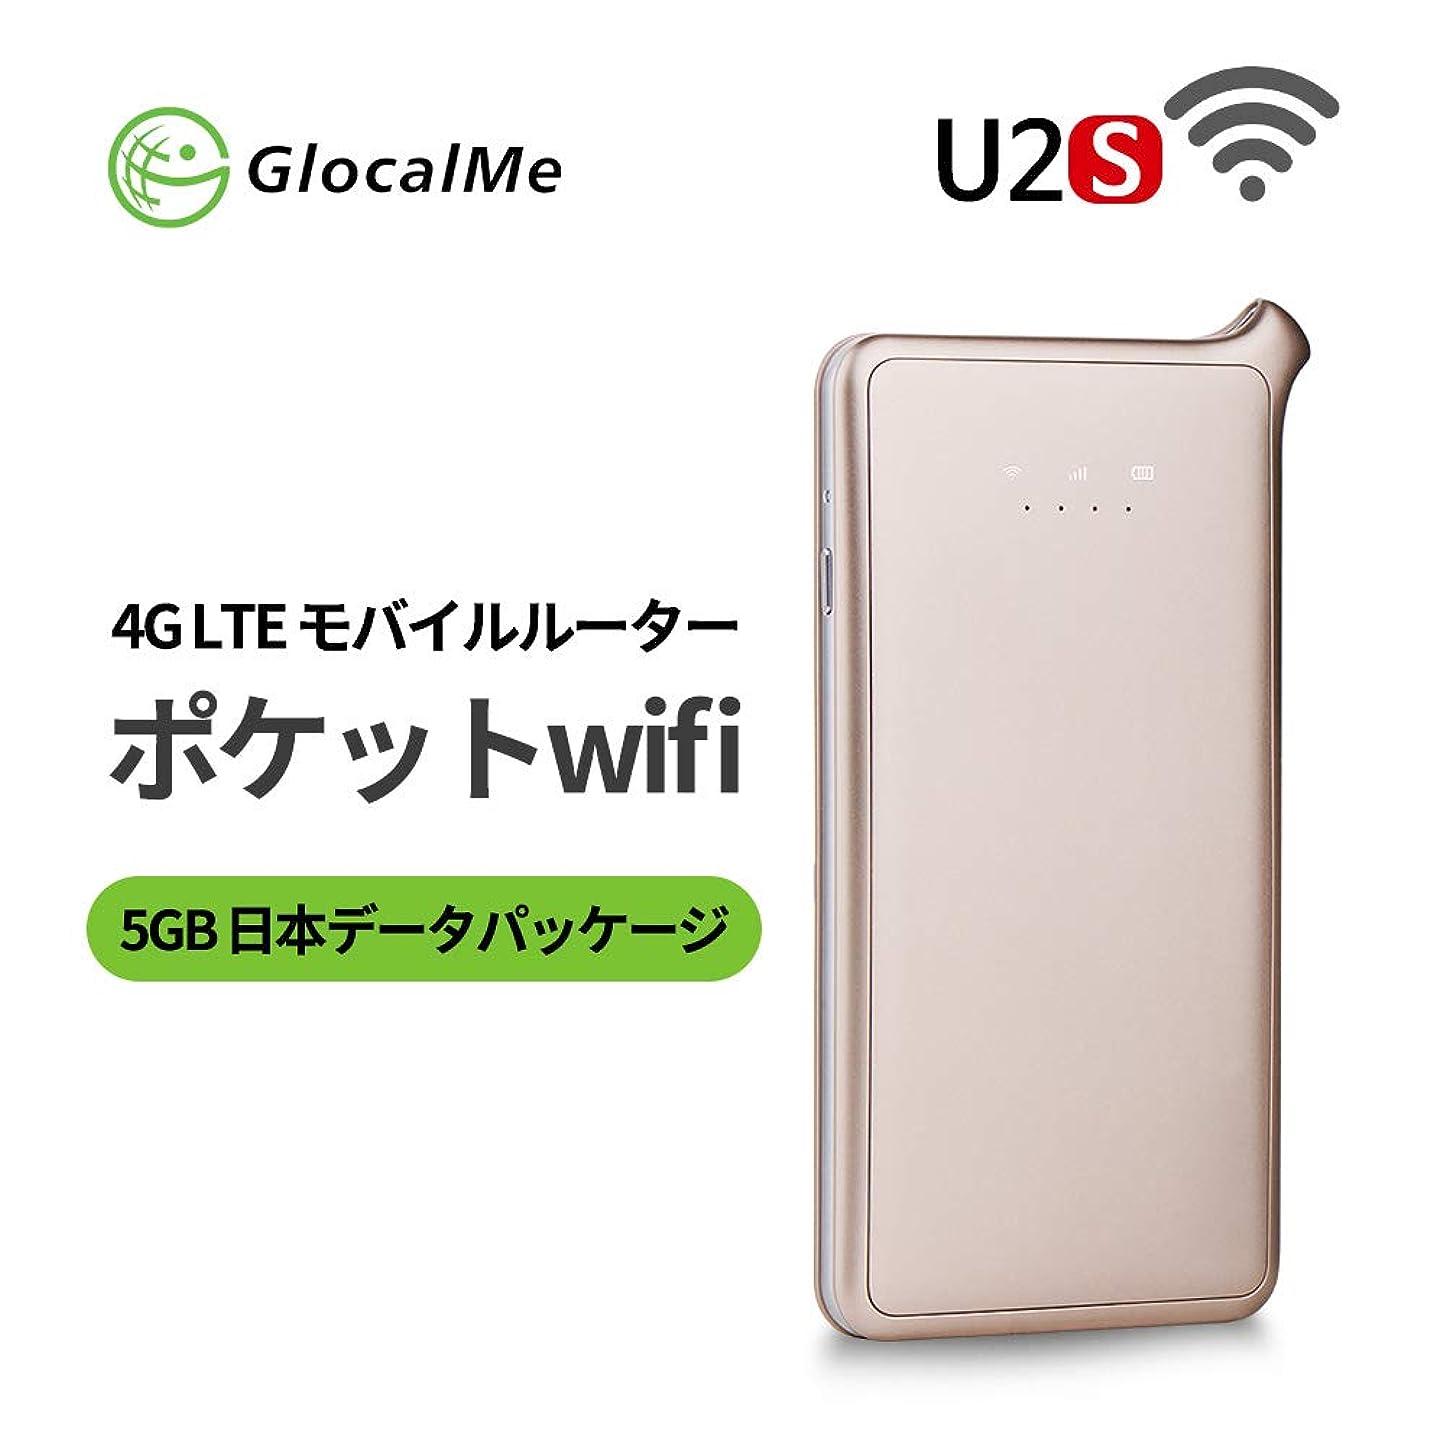 GlocalMe U2S モバイルWiFiルーター 5GB日本データパック付け ポケットWiFi 高速4G LTE simフリー